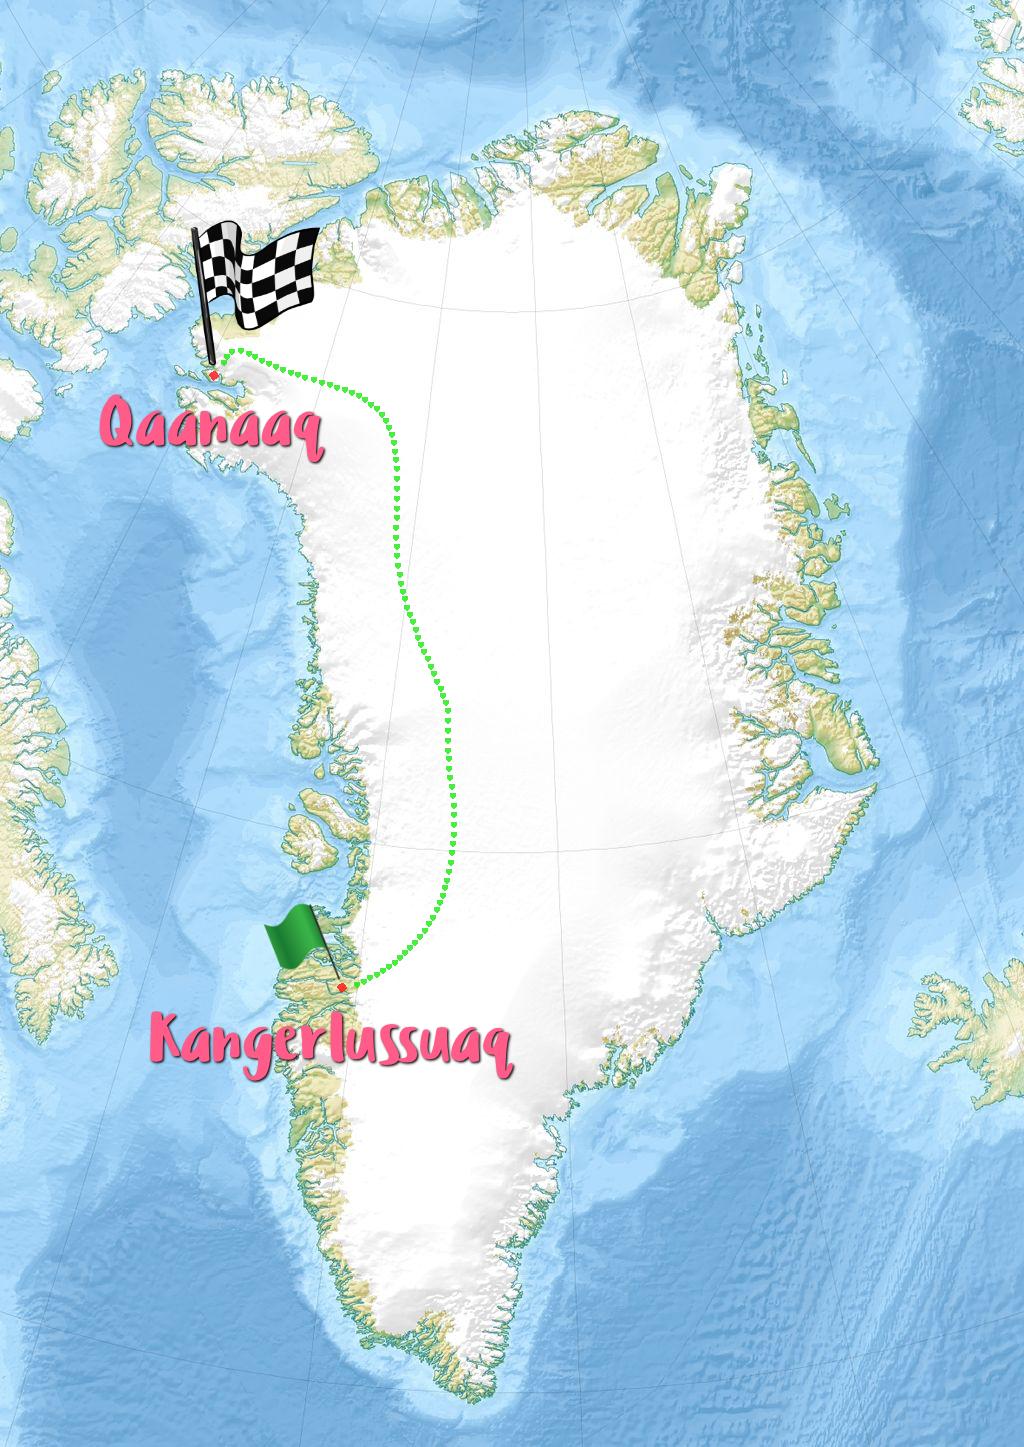 GreenlandMap.png